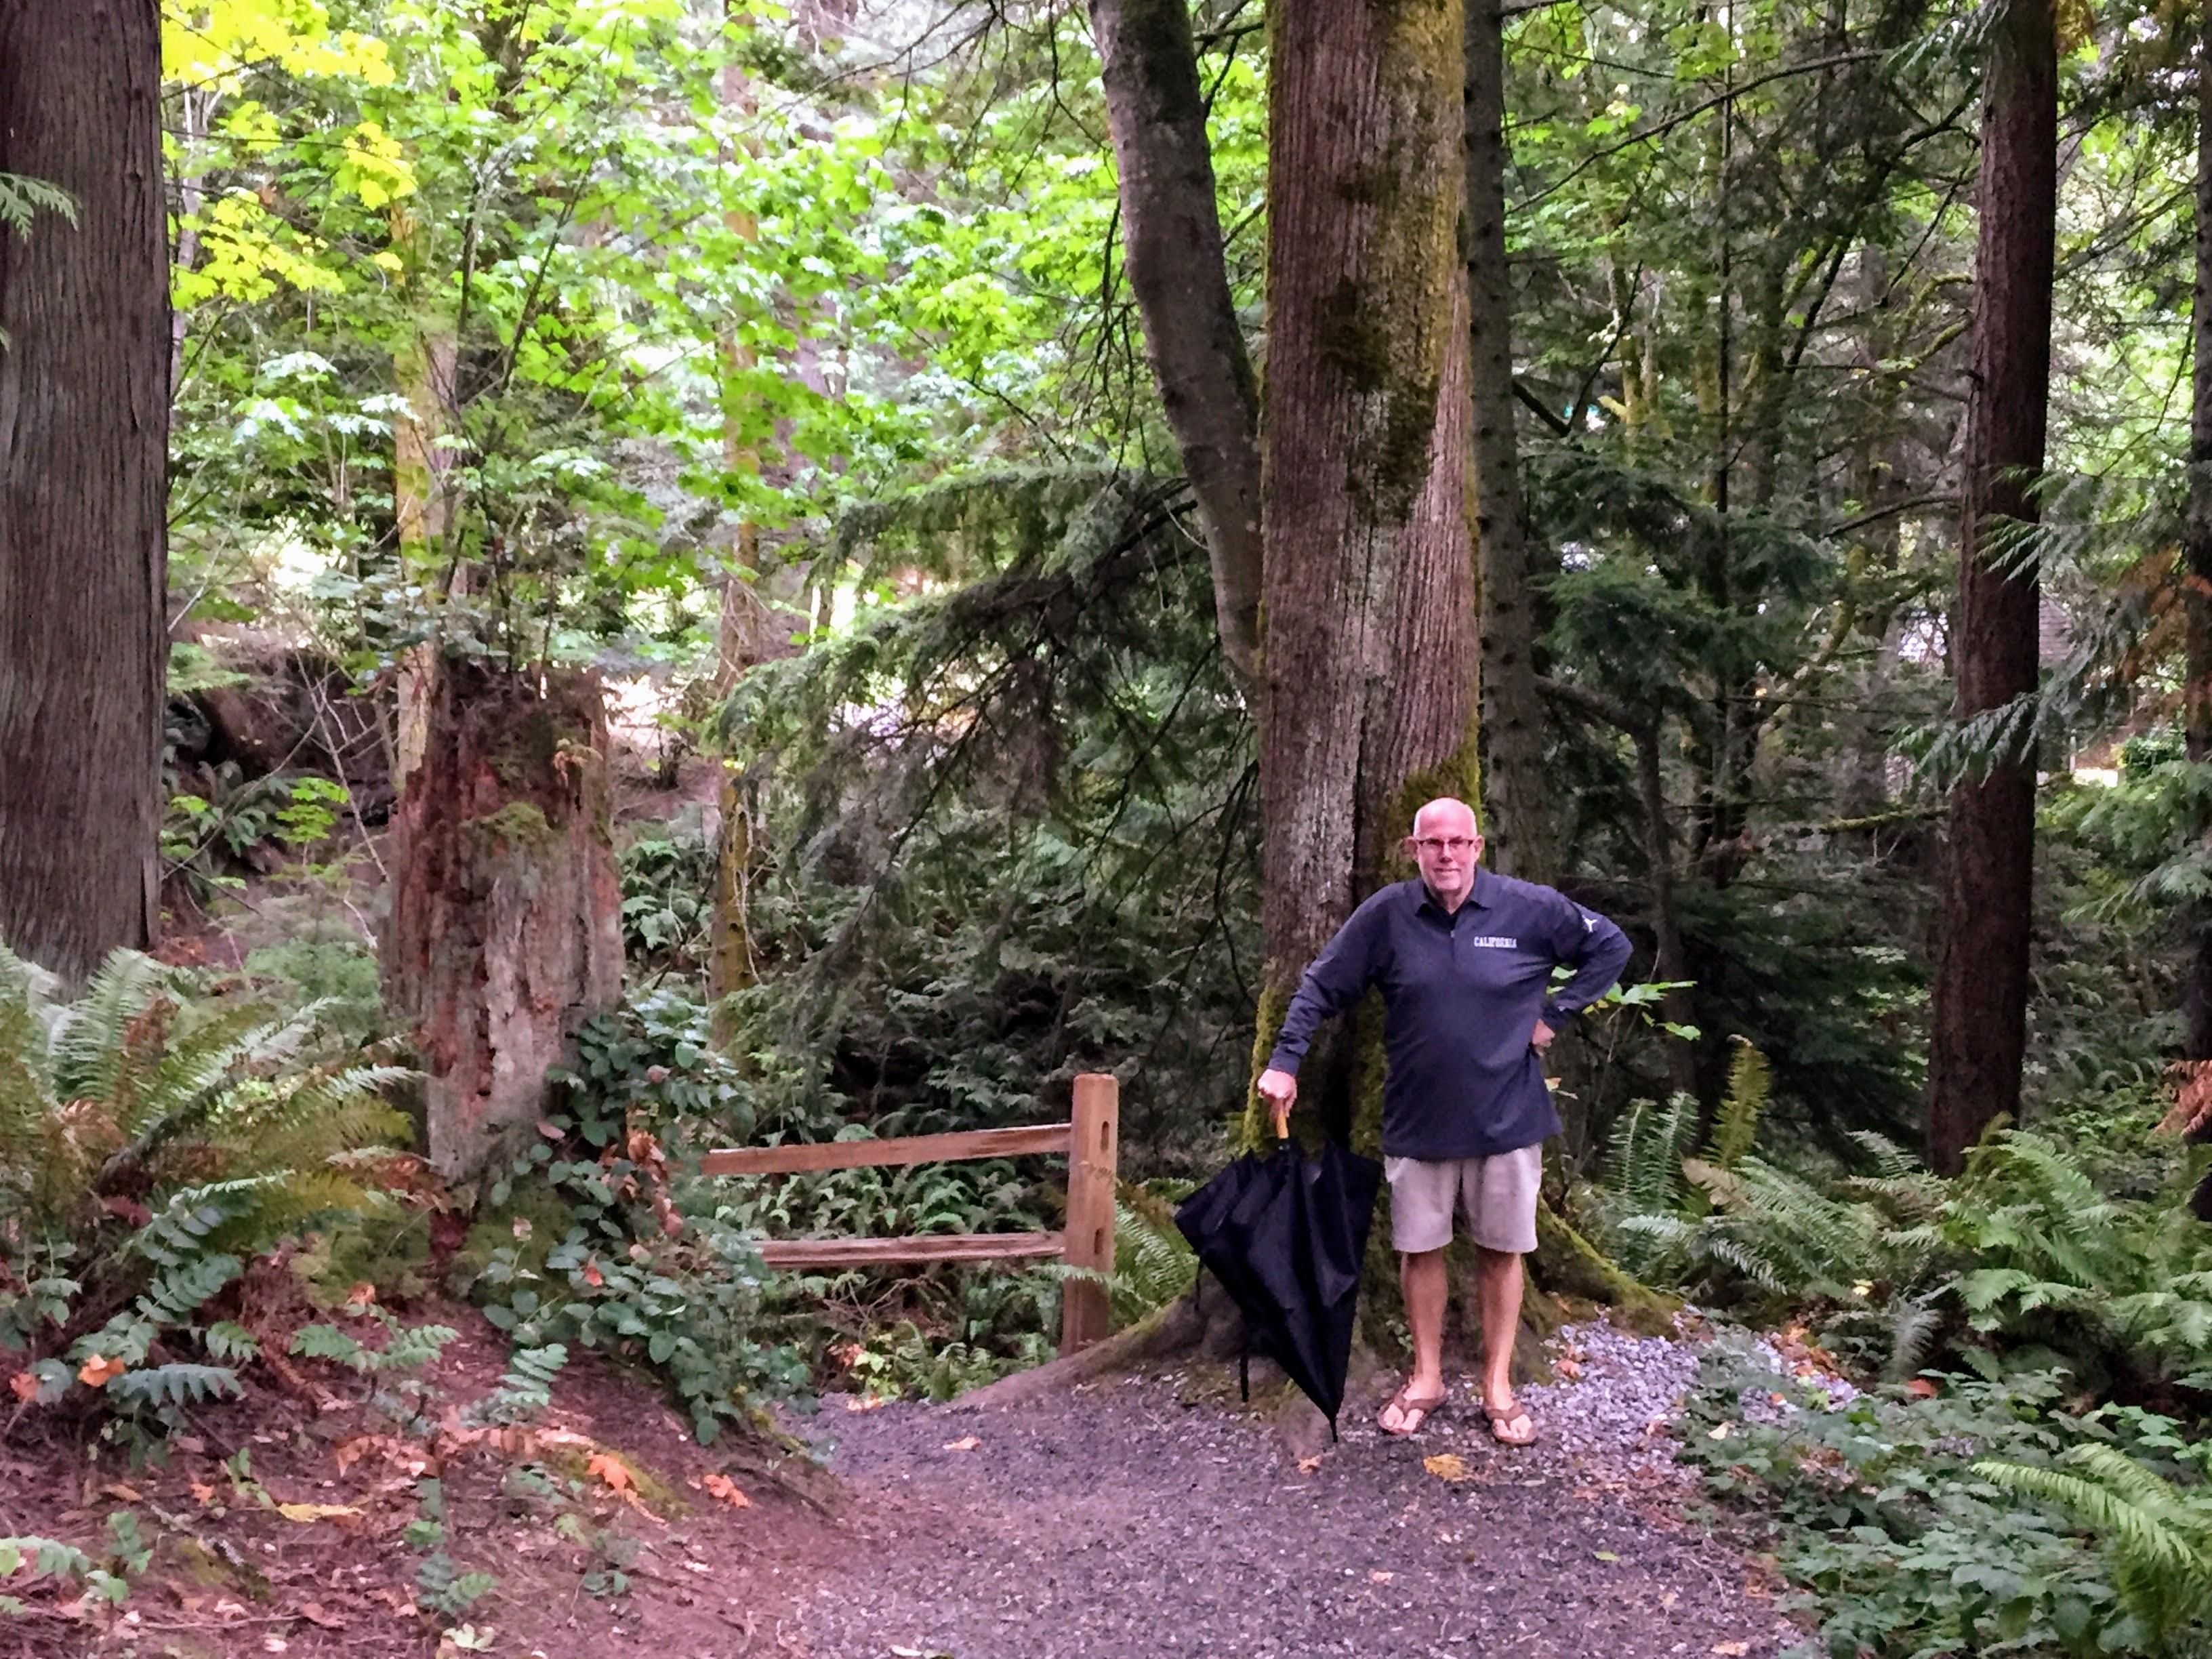 2017-09-25 Washington 01 Larrabee State Park 01